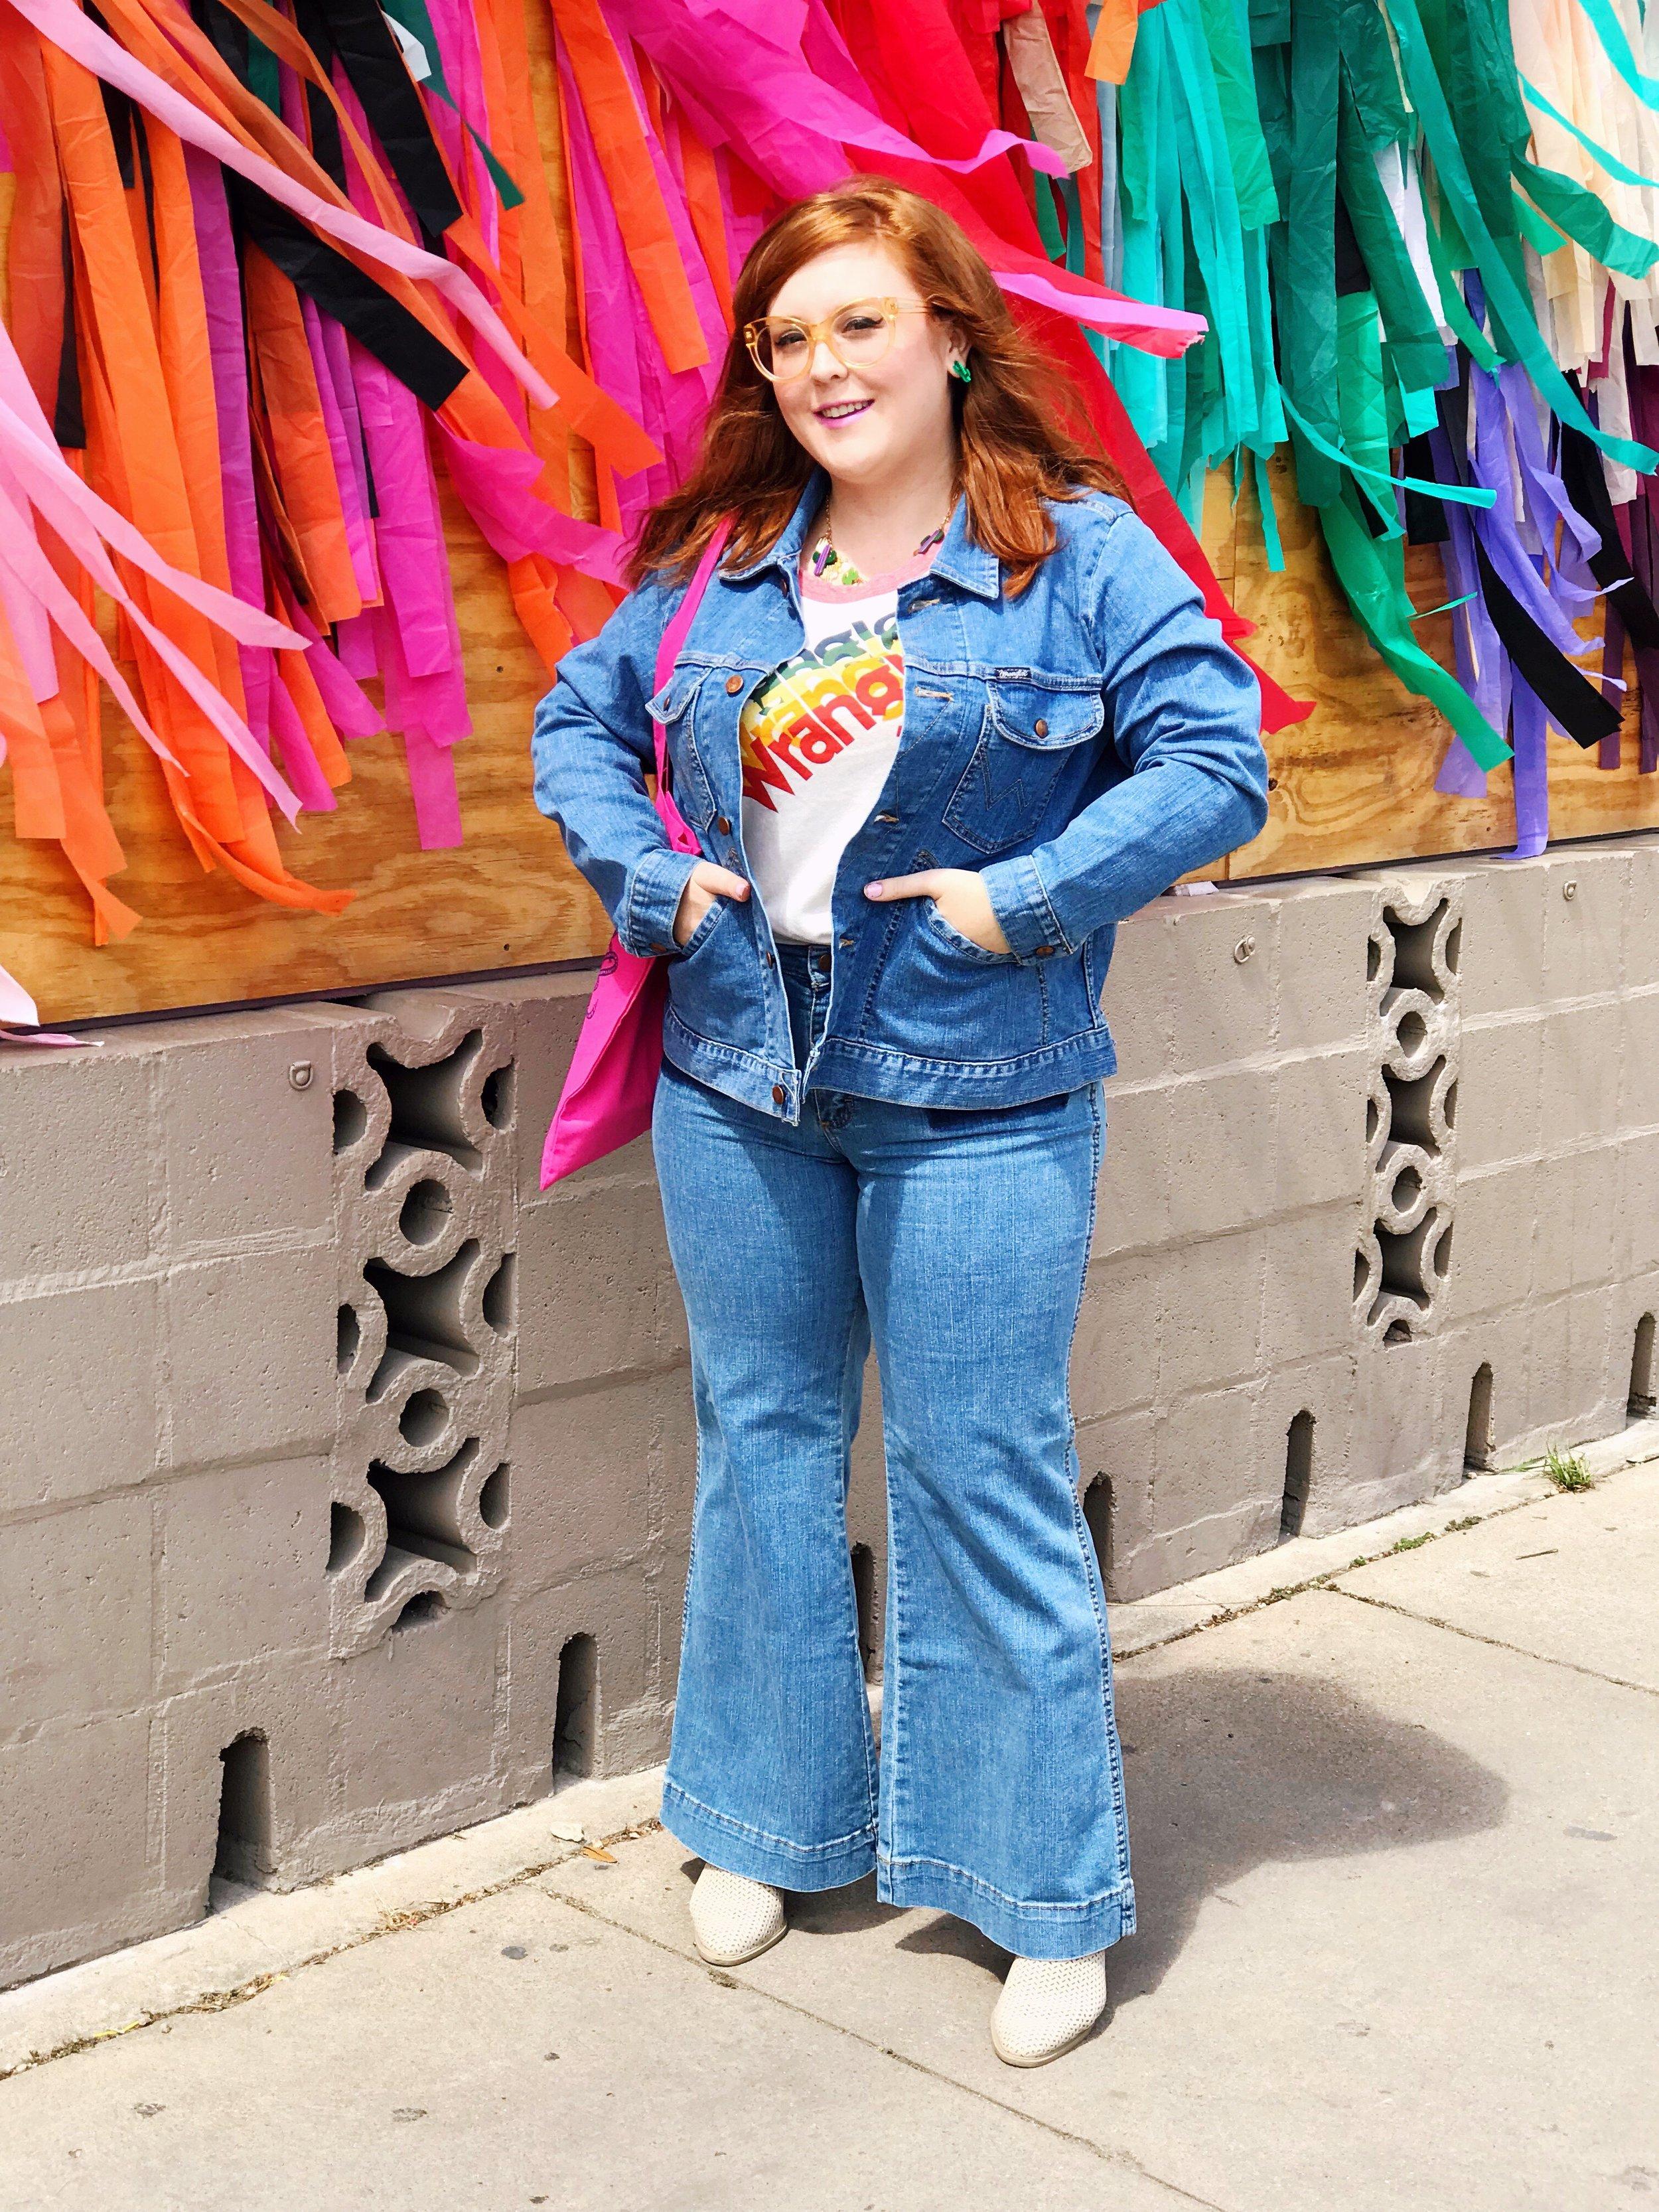 modcloth x wrangler jeans sxsw south congress austin texas natalie merola ginger me glam 1